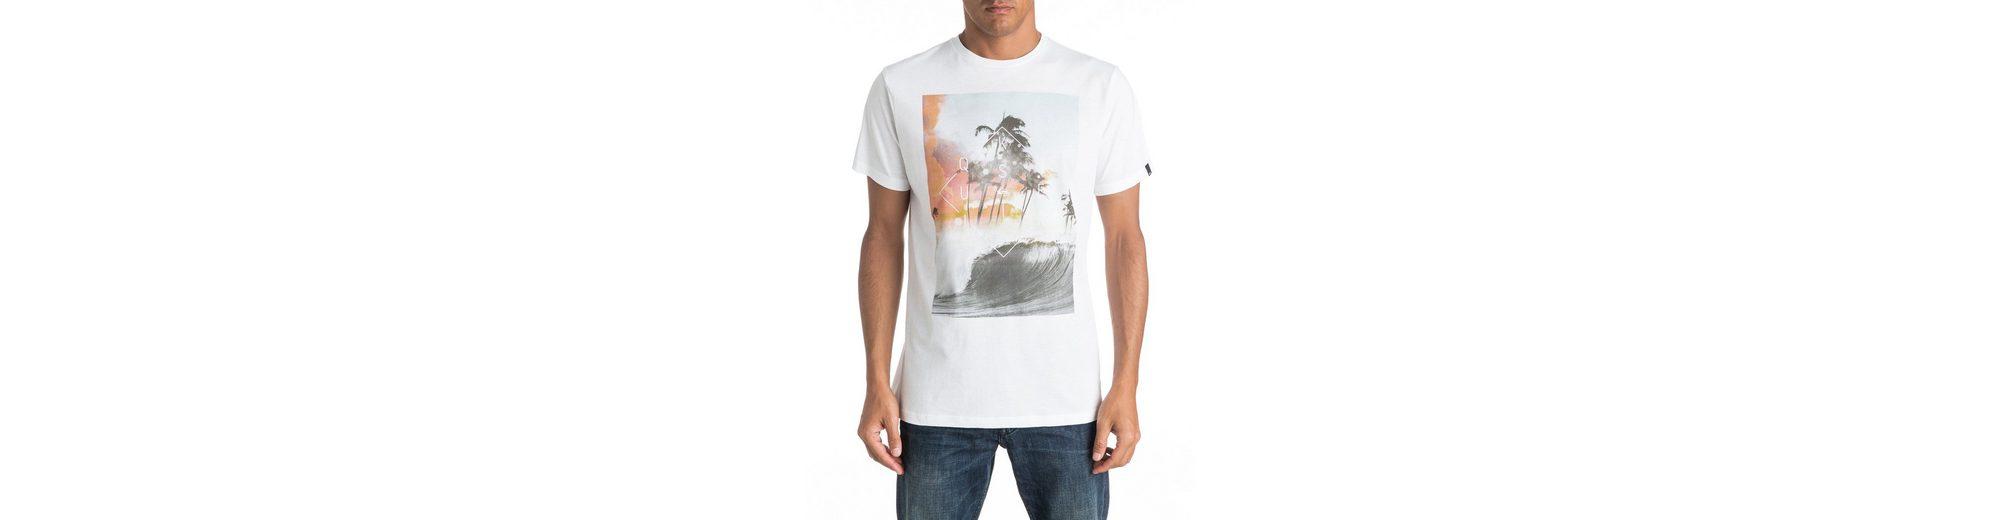 Quiksilver T-Shirt Classic Wave Thunder - T-Shirt Verkaufsstelle Echt Steckdose Echte Spielraum Geringe Versandgebühr oM36YNT